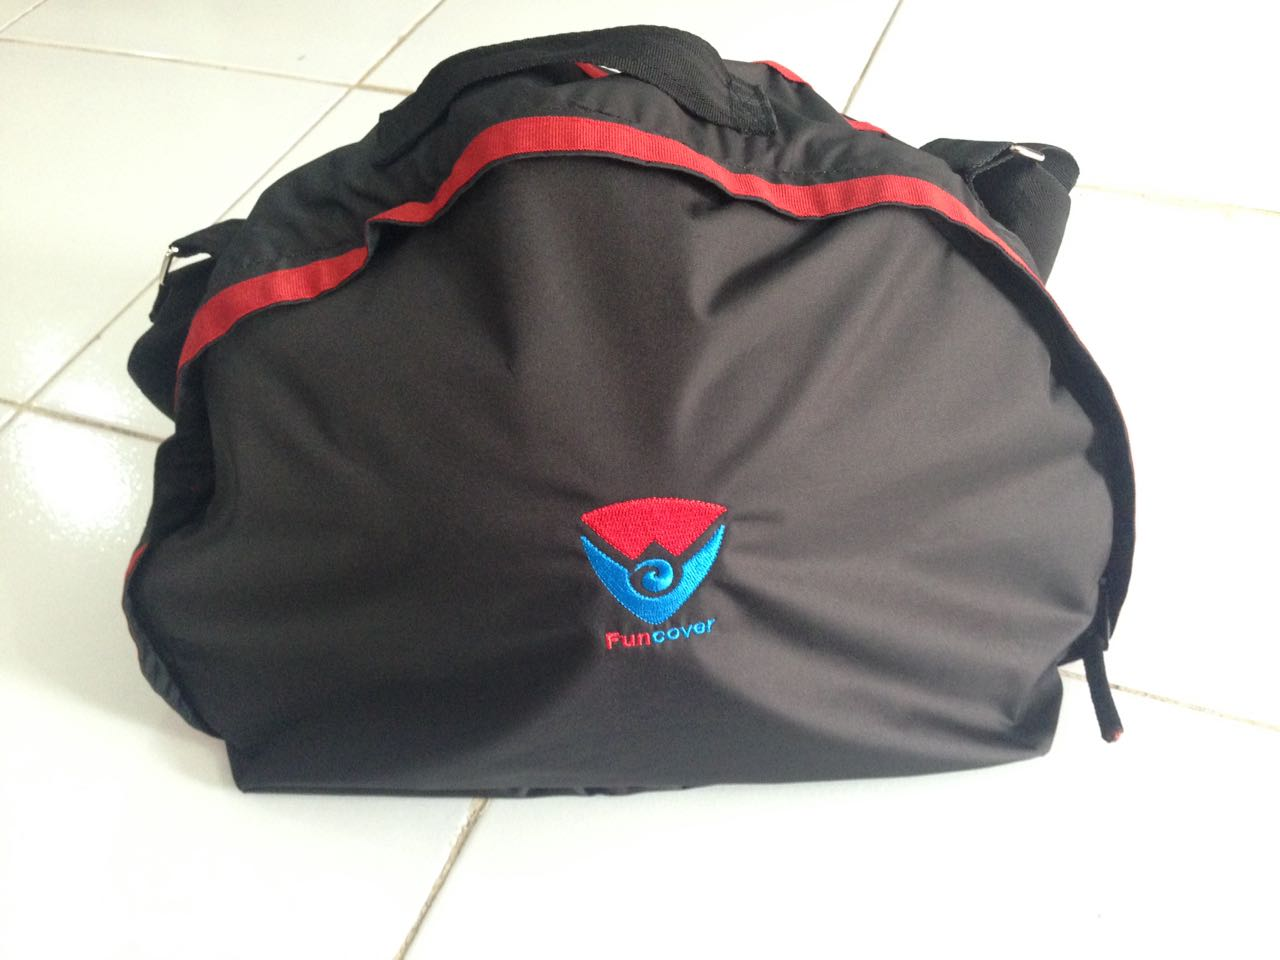 Voucher Ongkir Cover helm Premium Funcover v2 Jas Hujan Tas Helm Waterproof Slingba dari Tokopedia